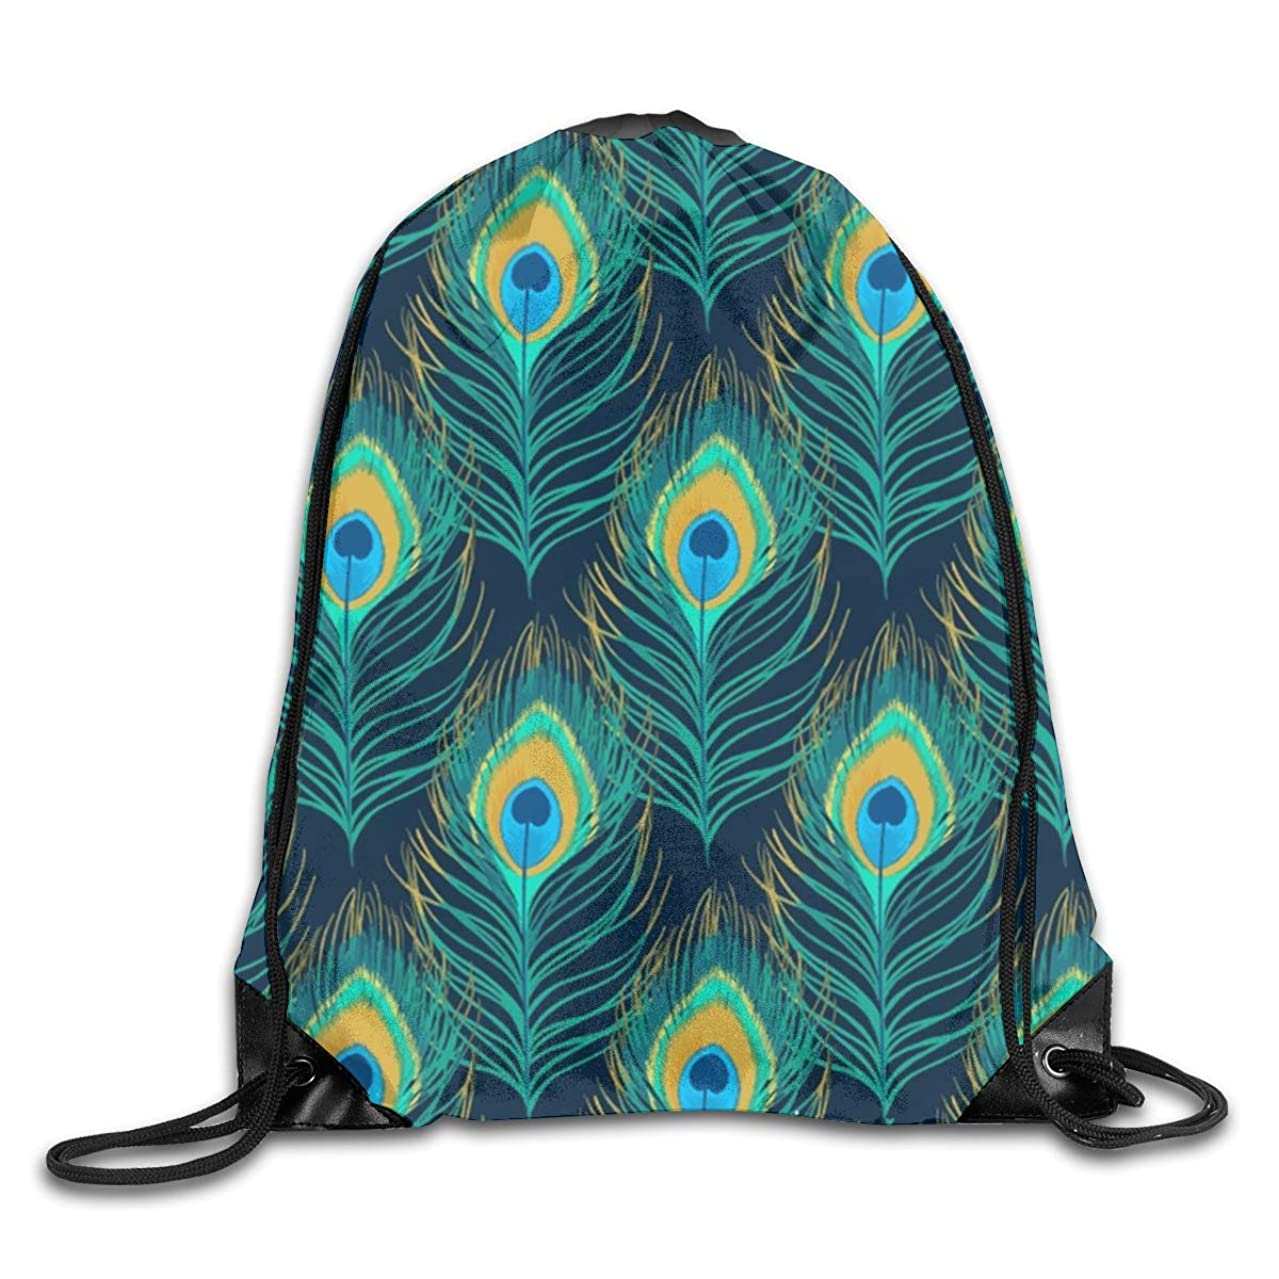 Watercolor Peacock Feather Men & Women Sport Gym Sack Dancing Bag Drawstring Backpack For Beach Hiking Travel Bags